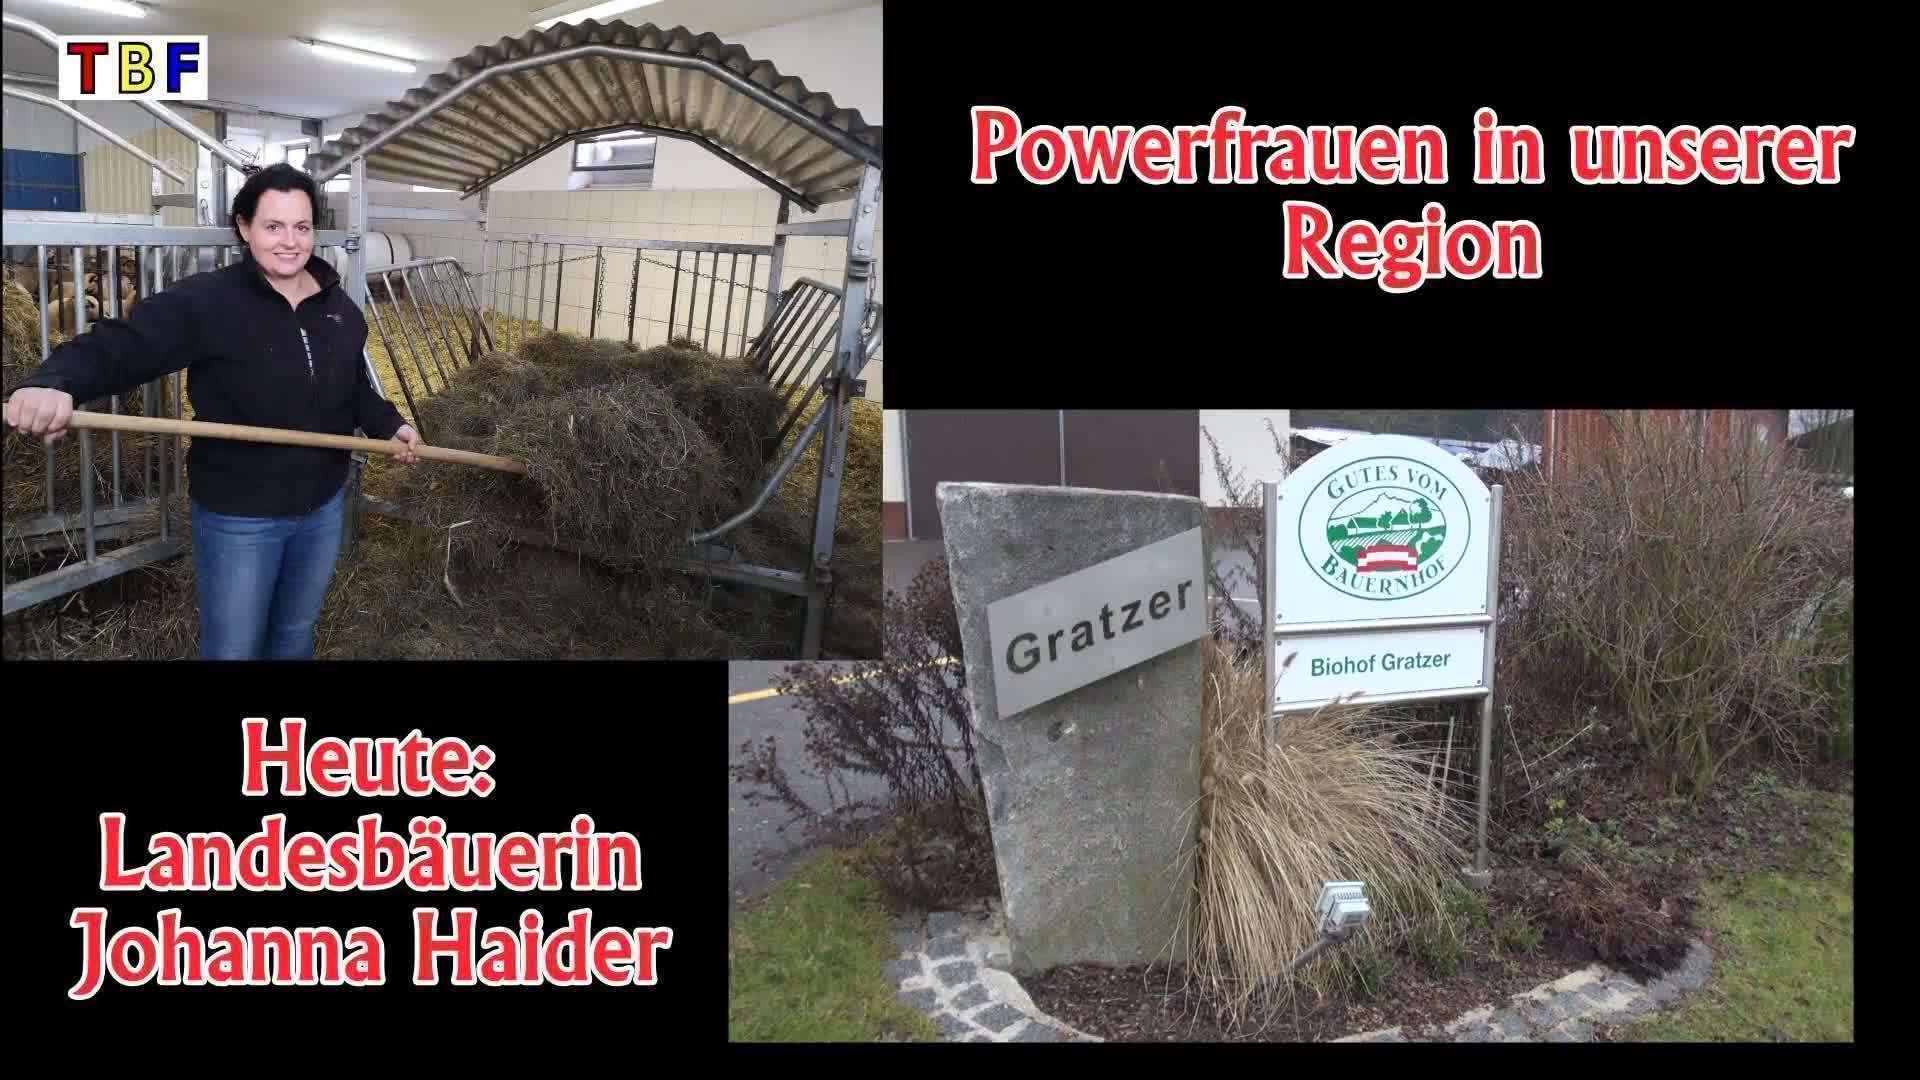 Powerfrauen in unserer Region / Landesbäuerin Johanna Haider